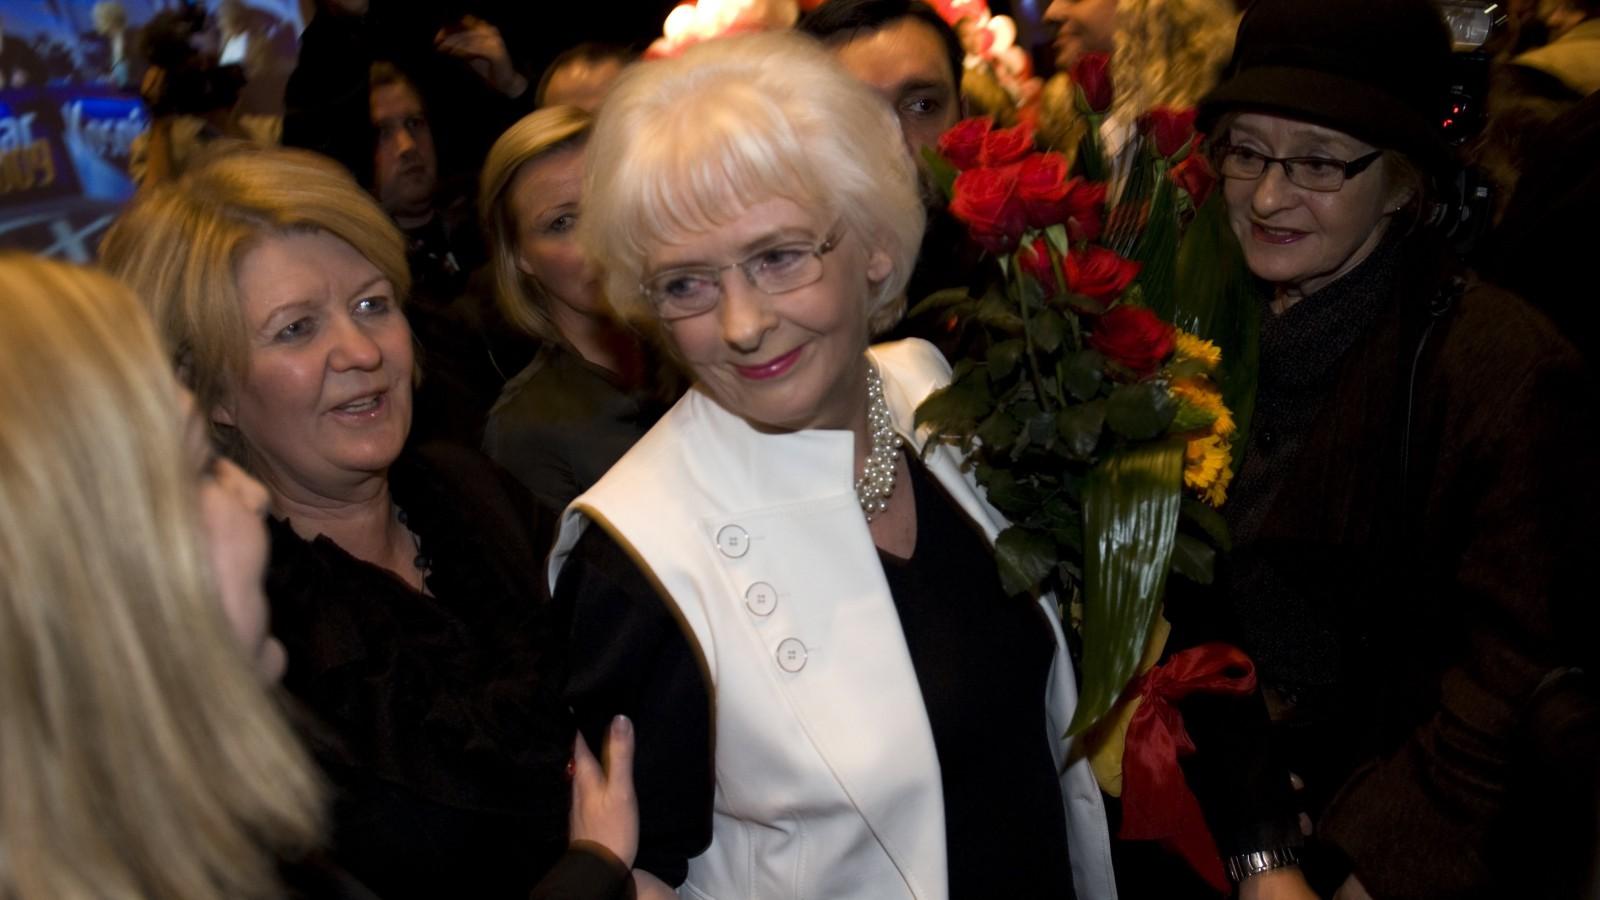 Johanna Sigurdardottir, former prime minister of Iceland, in 2009.